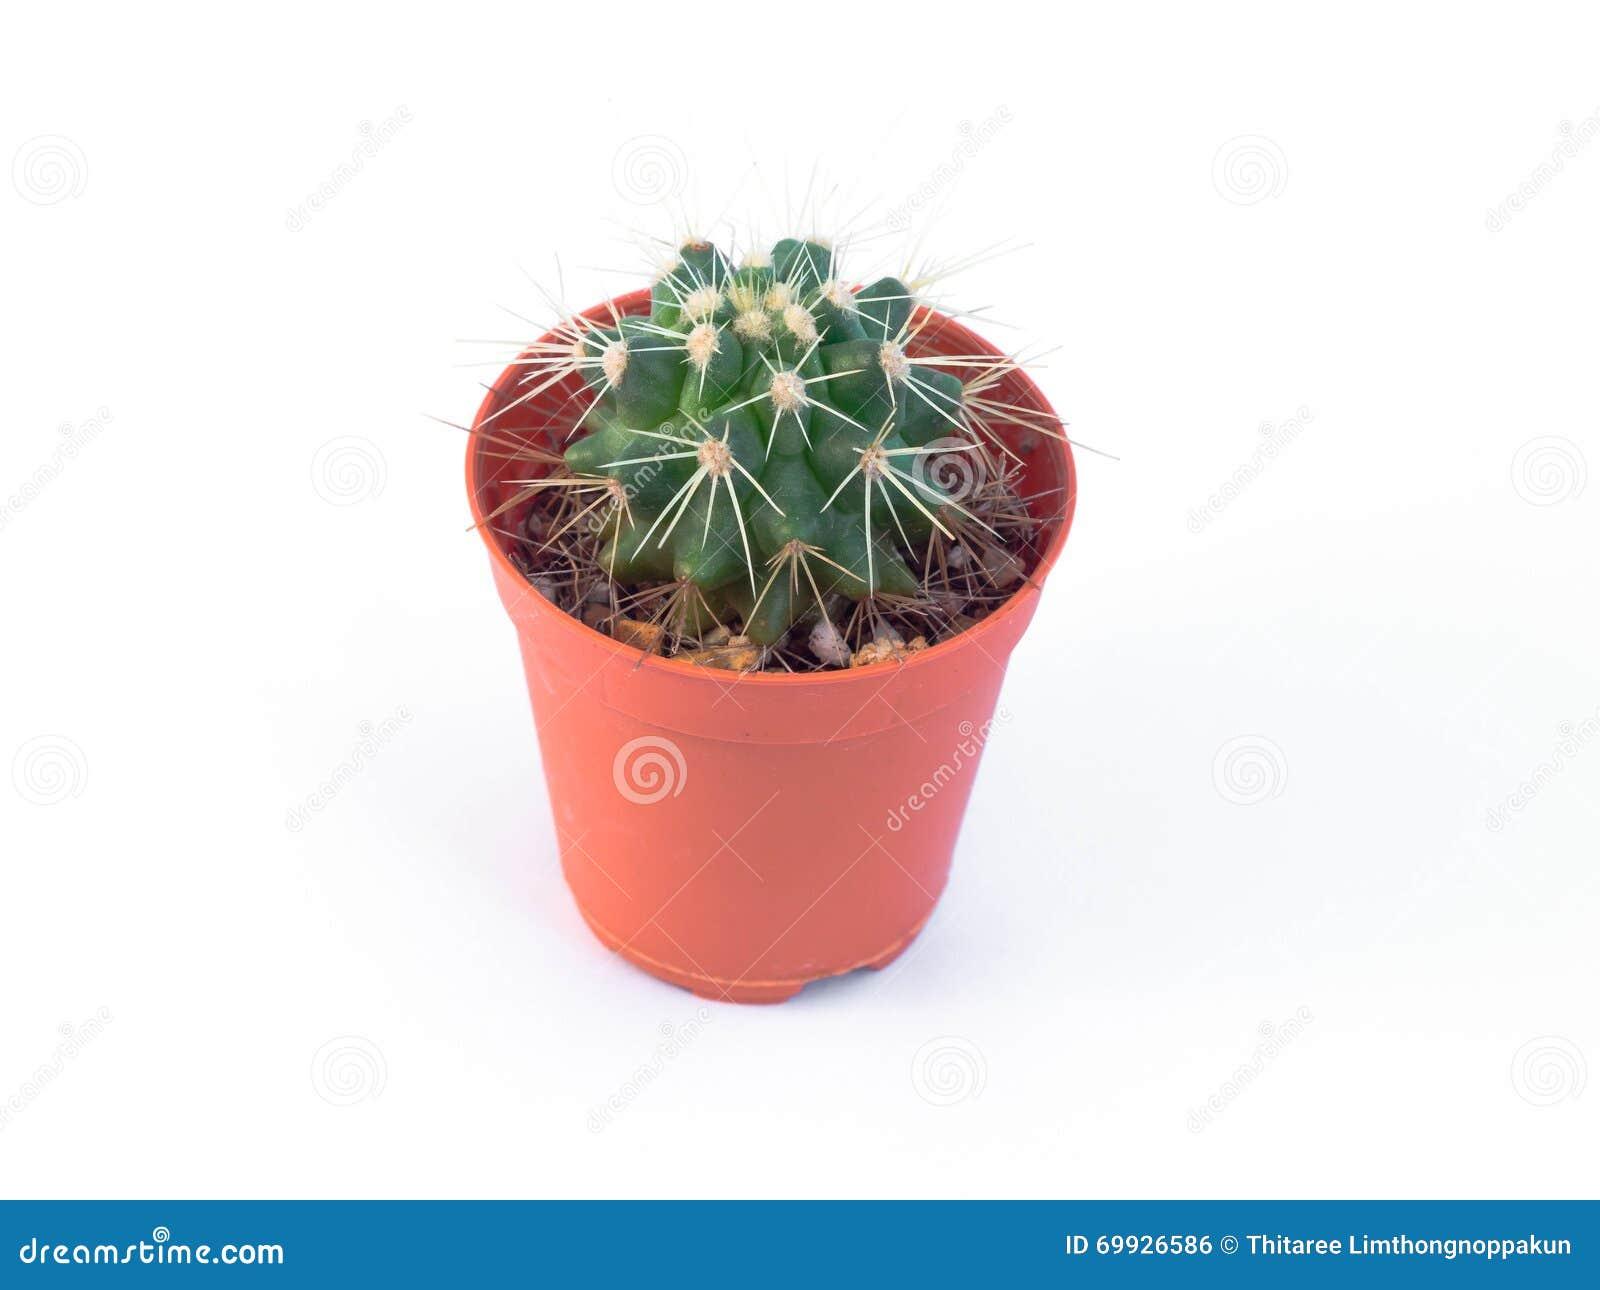 Kaktus Im Miniplastiktopf Stockfoto Bild Von Kaktus 69926586